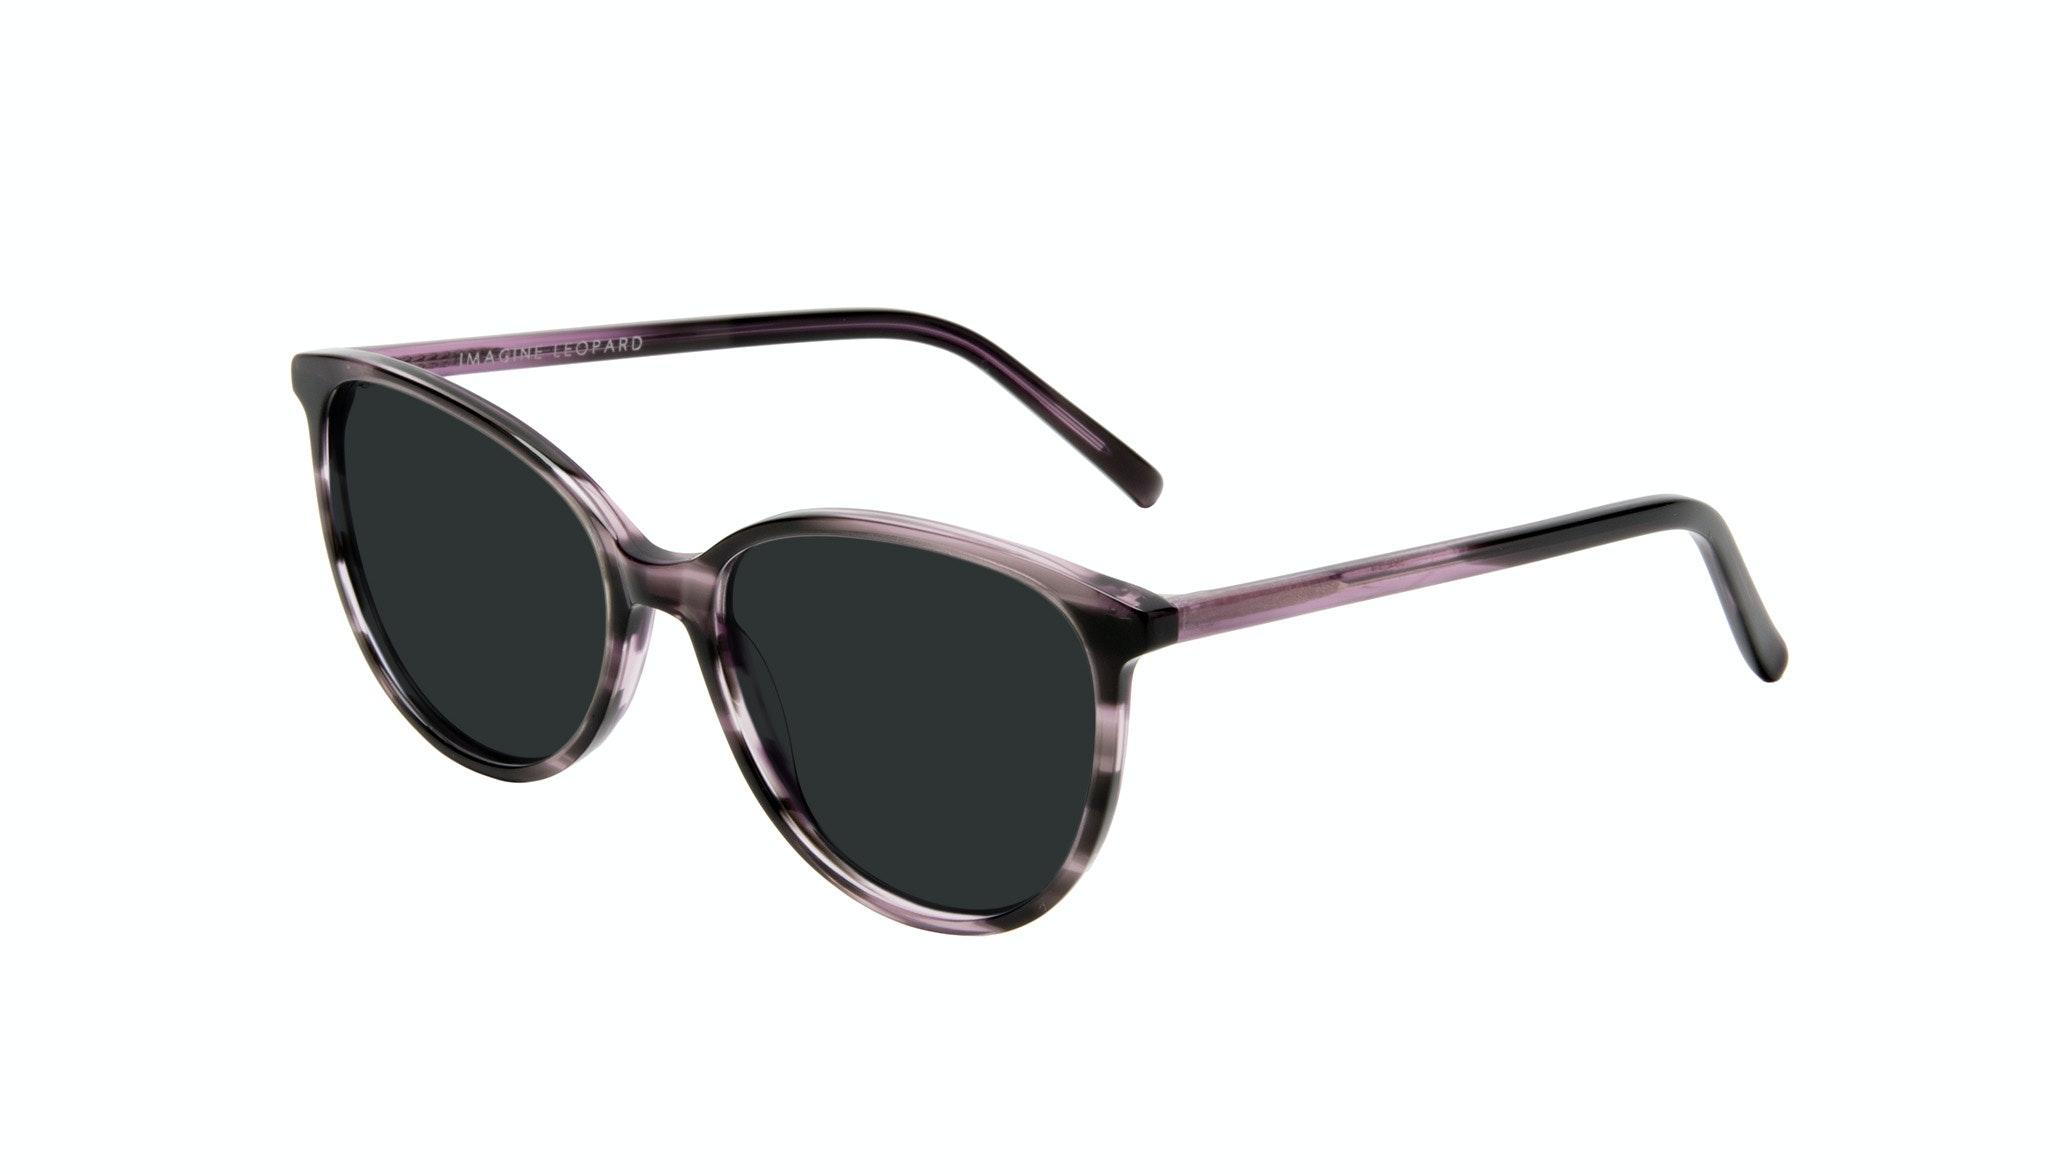 Affordable Fashion Glasses Round Sunglasses Women Imagine Leopard Tilt